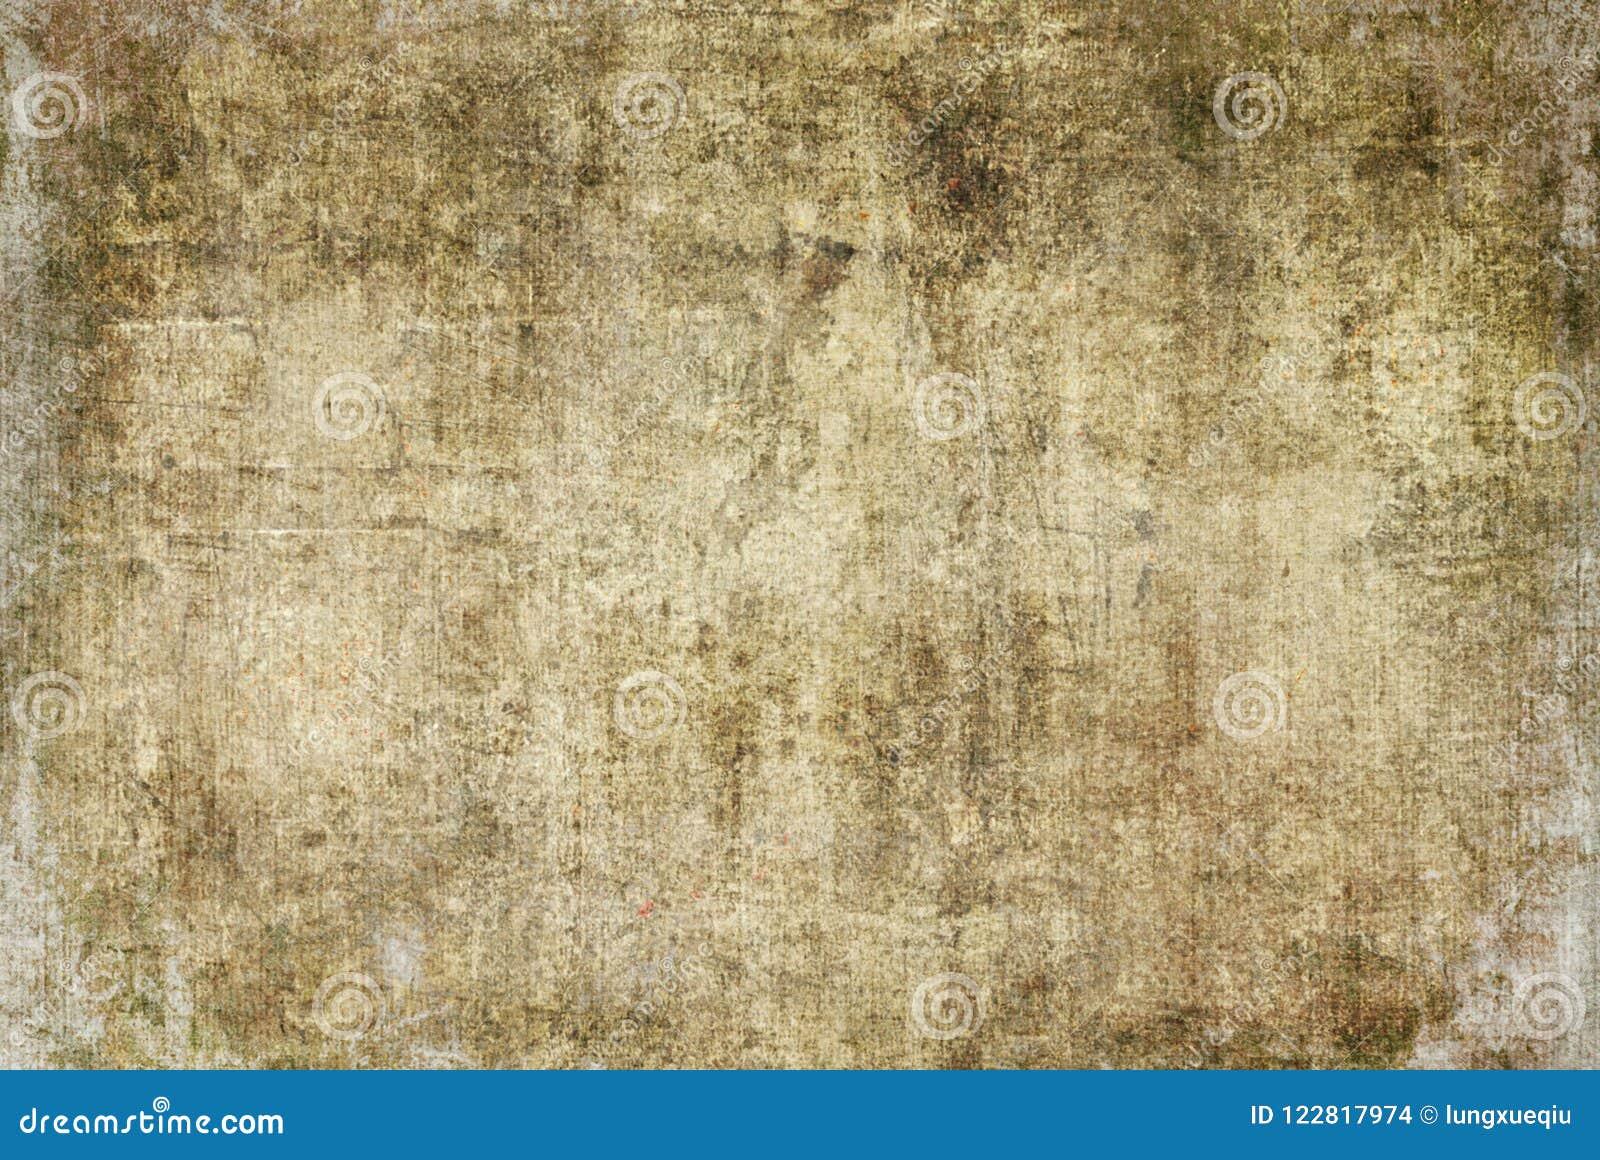 Gebrochener Schmutz-dunkles Rusty Distorted Decay Old Abstract-Segeltuch-Malerei-Beschaffenheits-Muster Autumn Background Wallpap